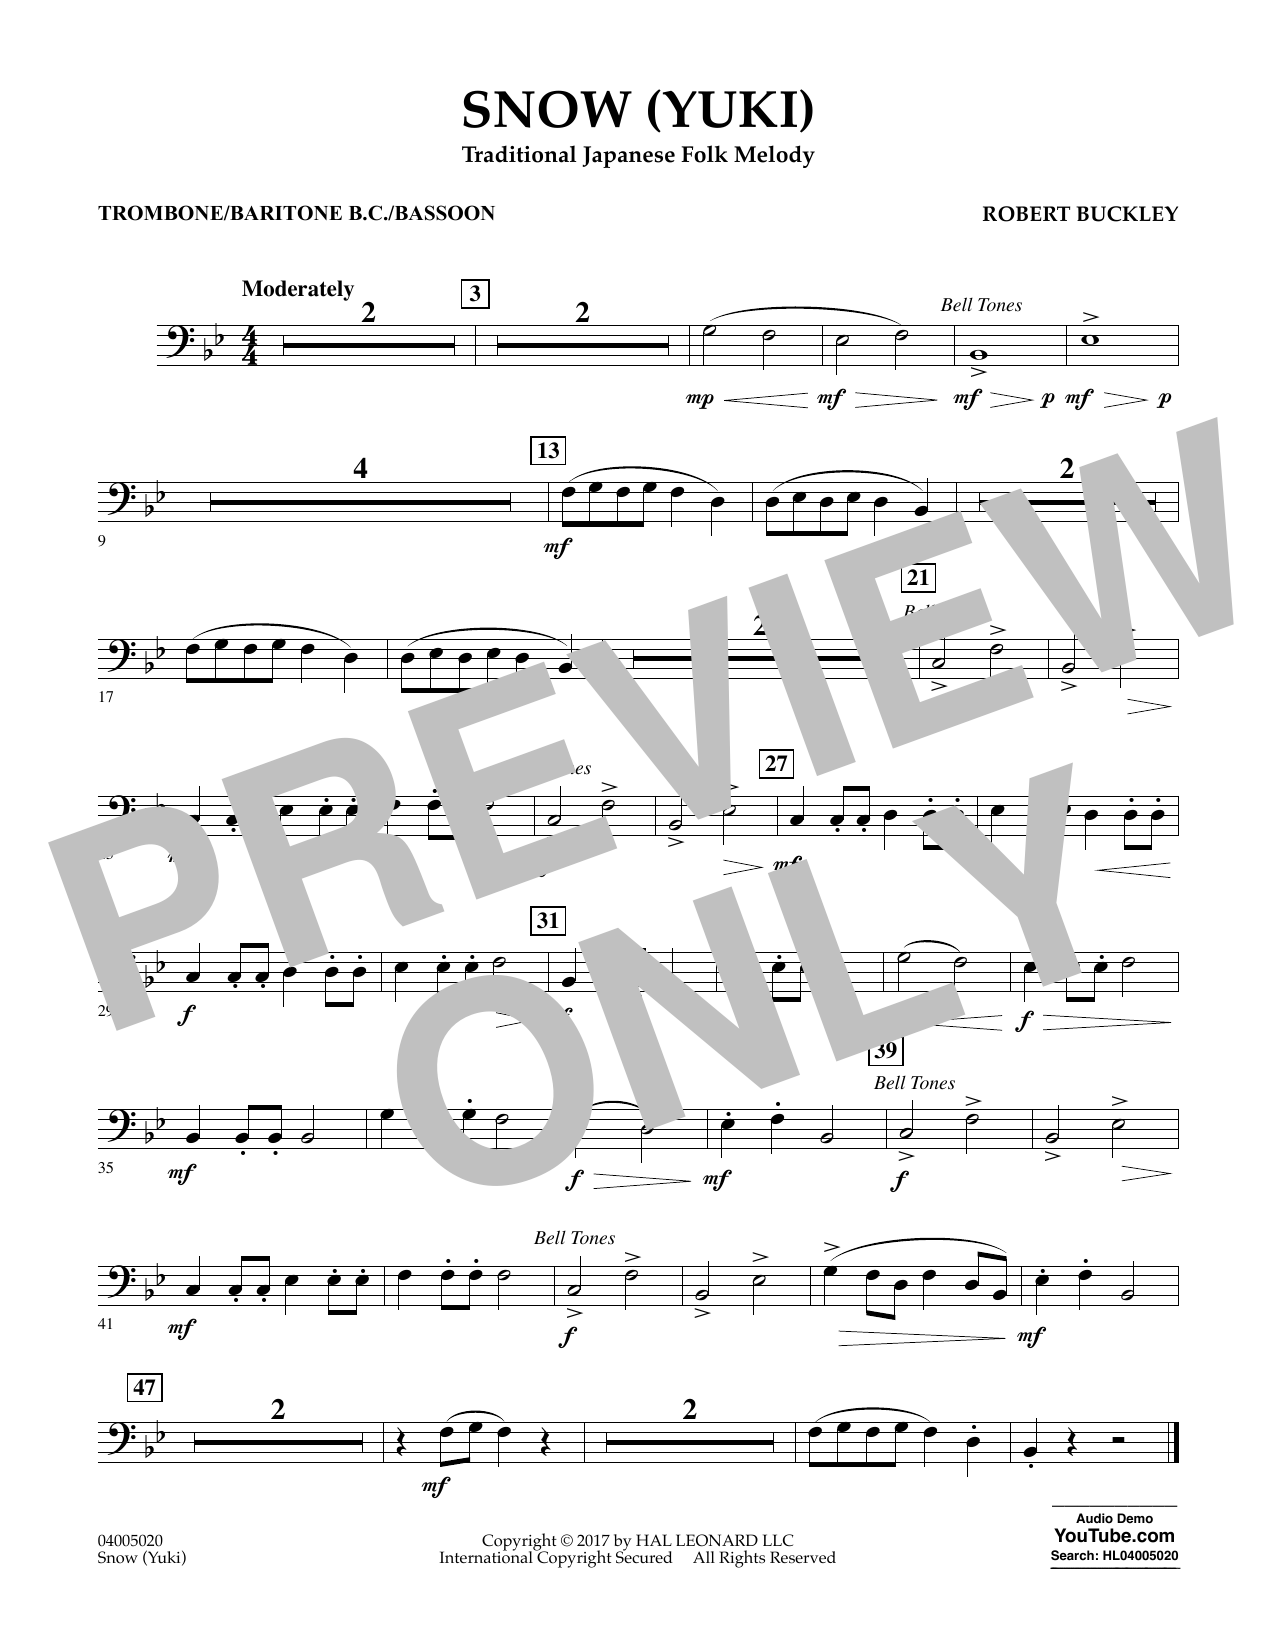 Snow (Yuki) - Trombone/Baritone B.C./Bassoon Partituras Digitales